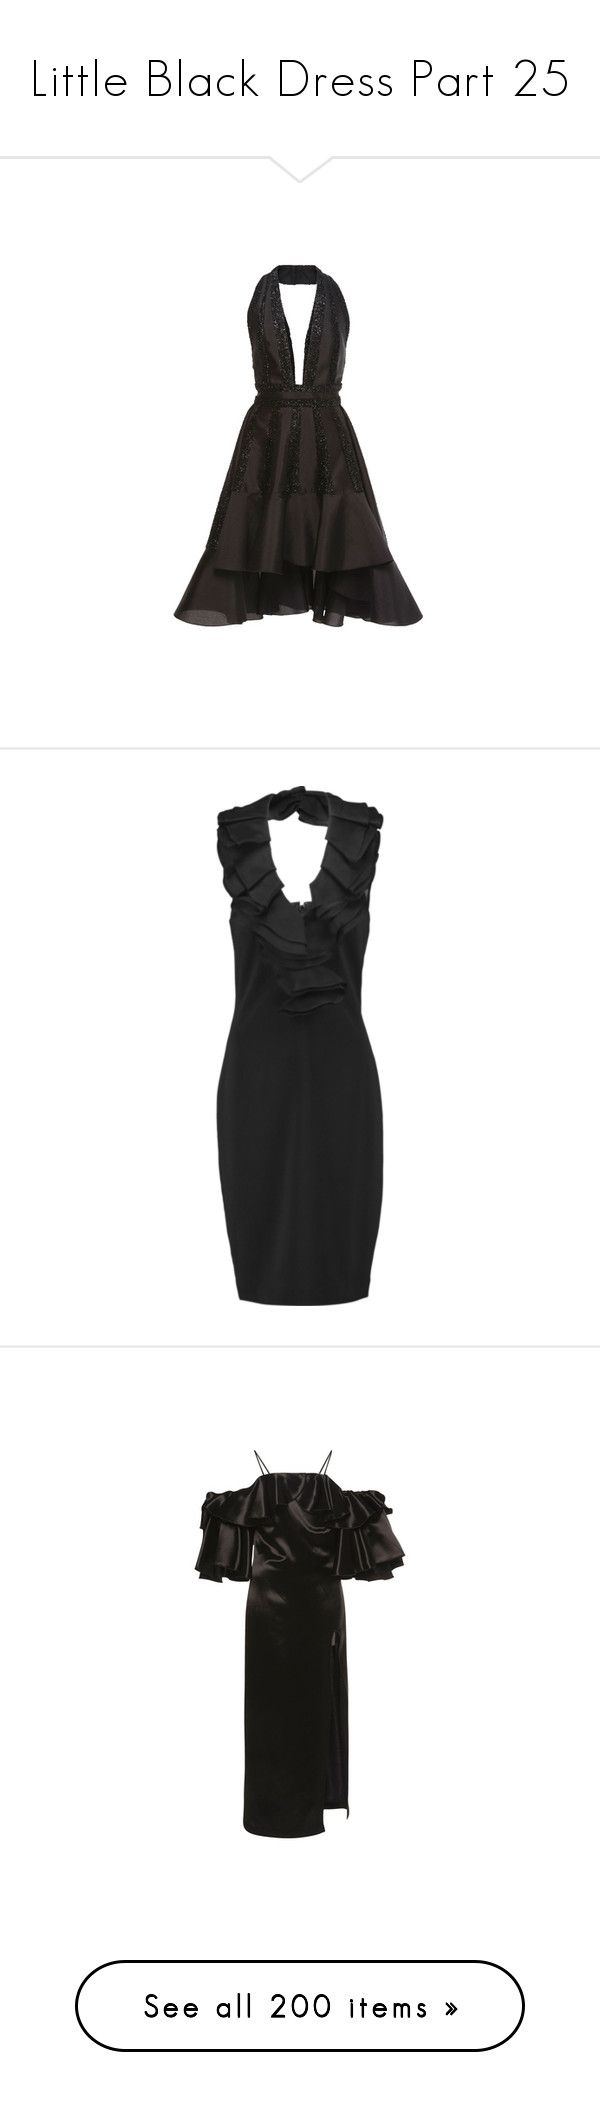 """Little Black Dress Part 25"" by leanne-mcclean ❤ liked on Polyvore featuring dresses, black, red carpet dresses, ruffle front dress, halter-neck dresses, halter dress, flutter-sleeve dress, overlay dress, talbot runhof dresses and sequin embellished dress"